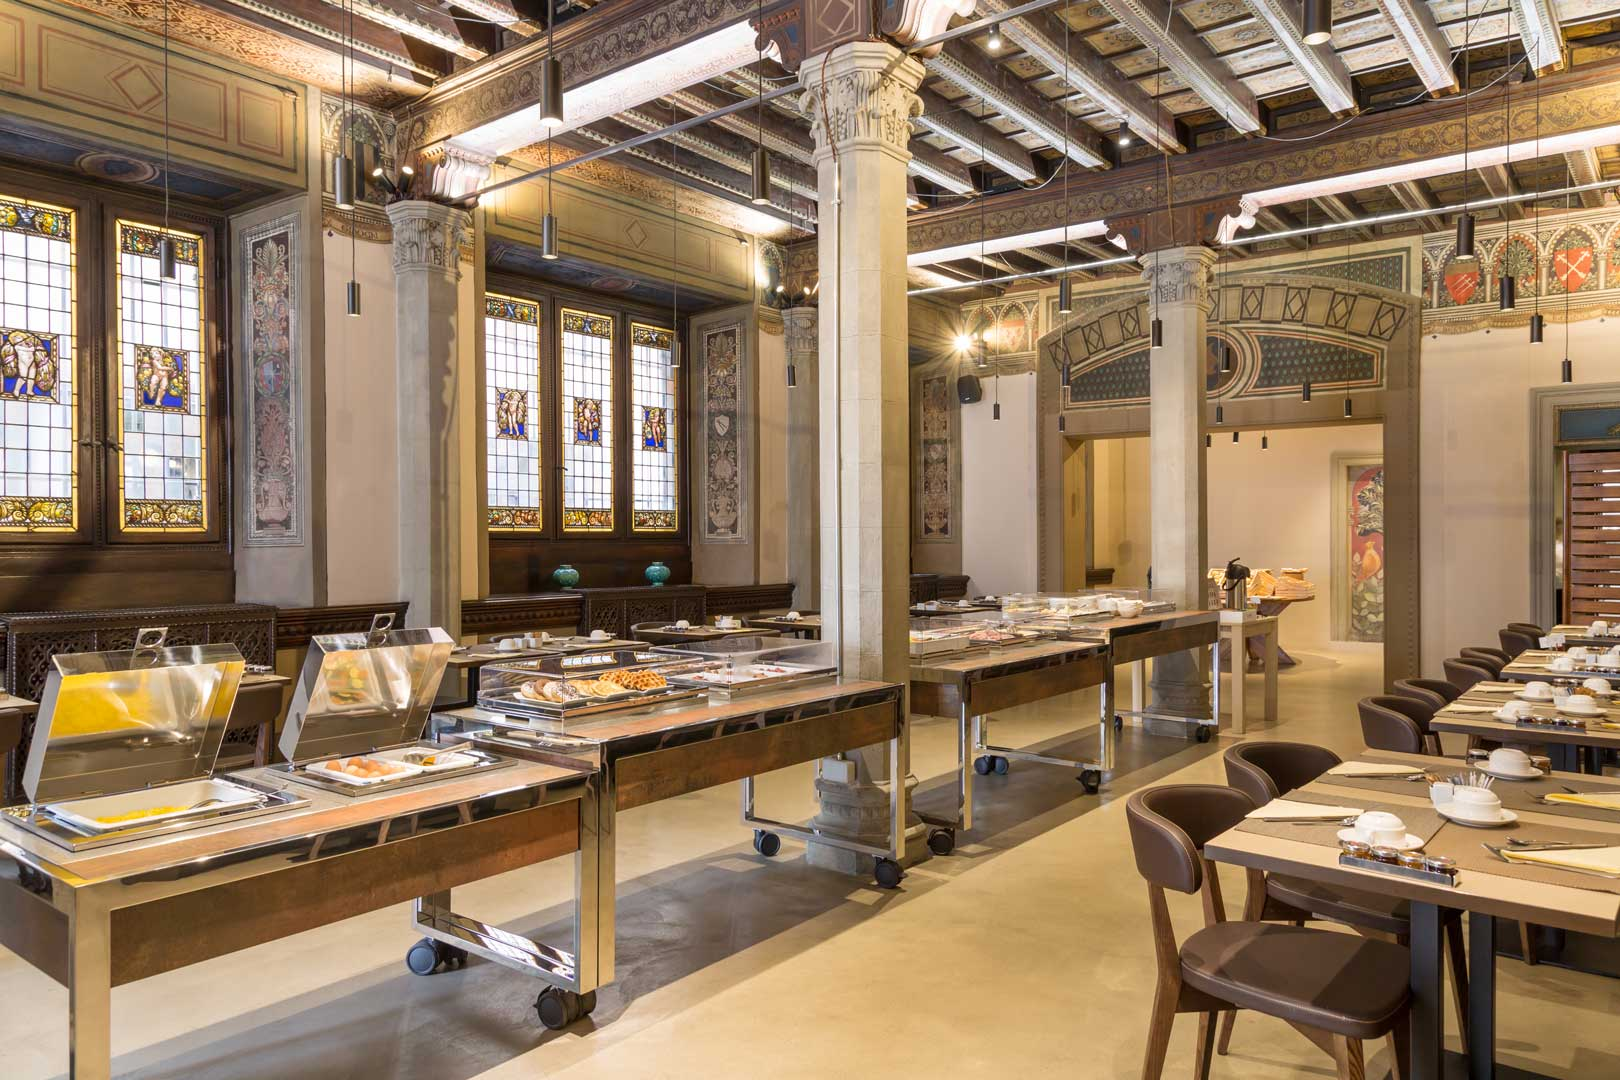 Grand Hotel Cavour - Firenze